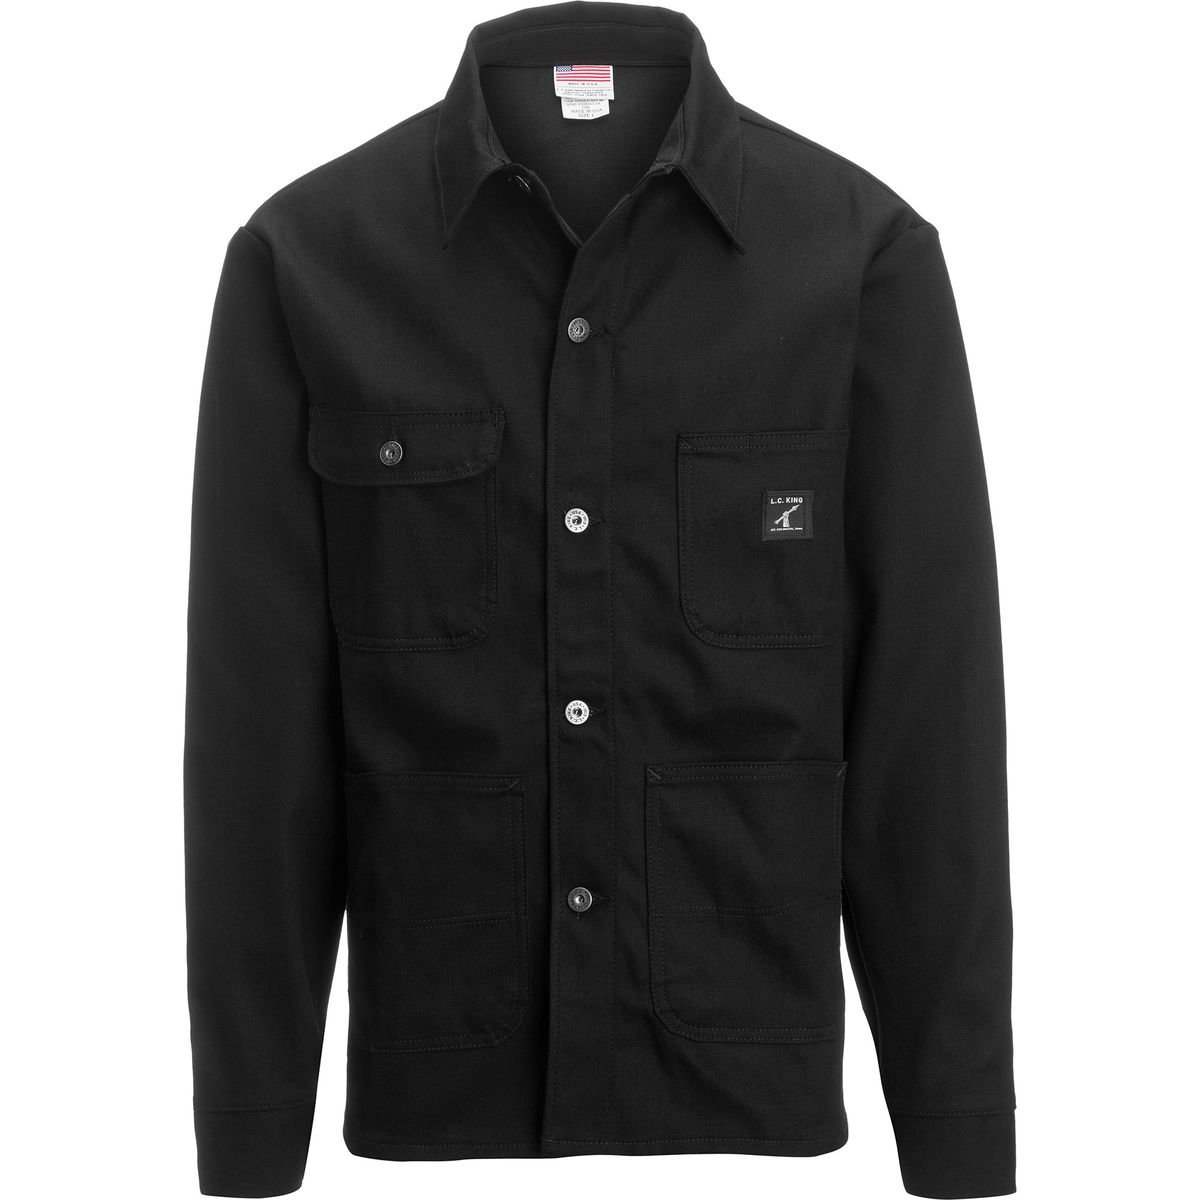 Pointer Brand Black Duck Chore Coat - Men's One Color, XL